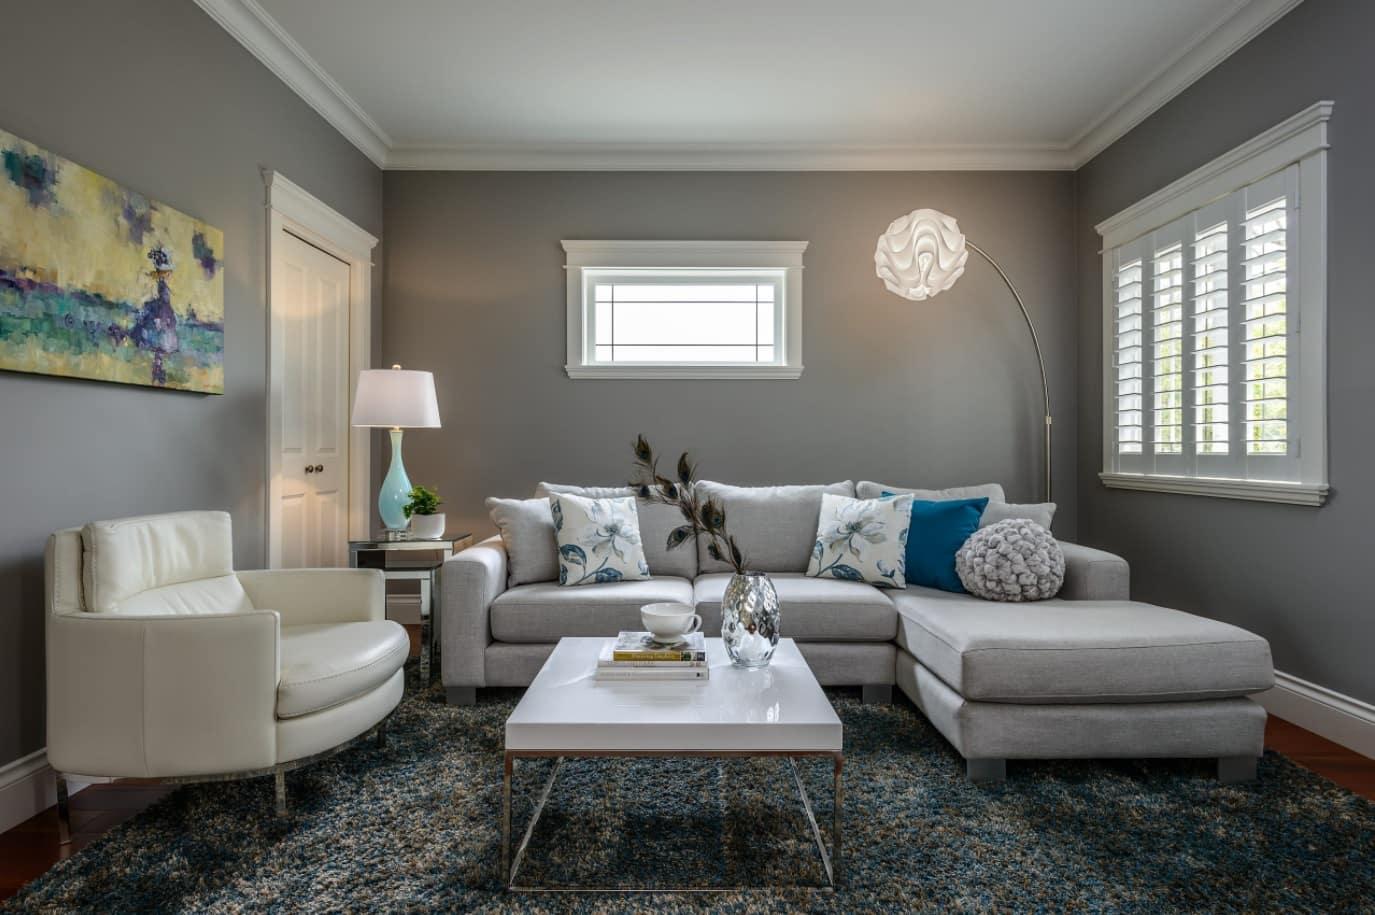 Gray classic room theme with angular upholstered sofa